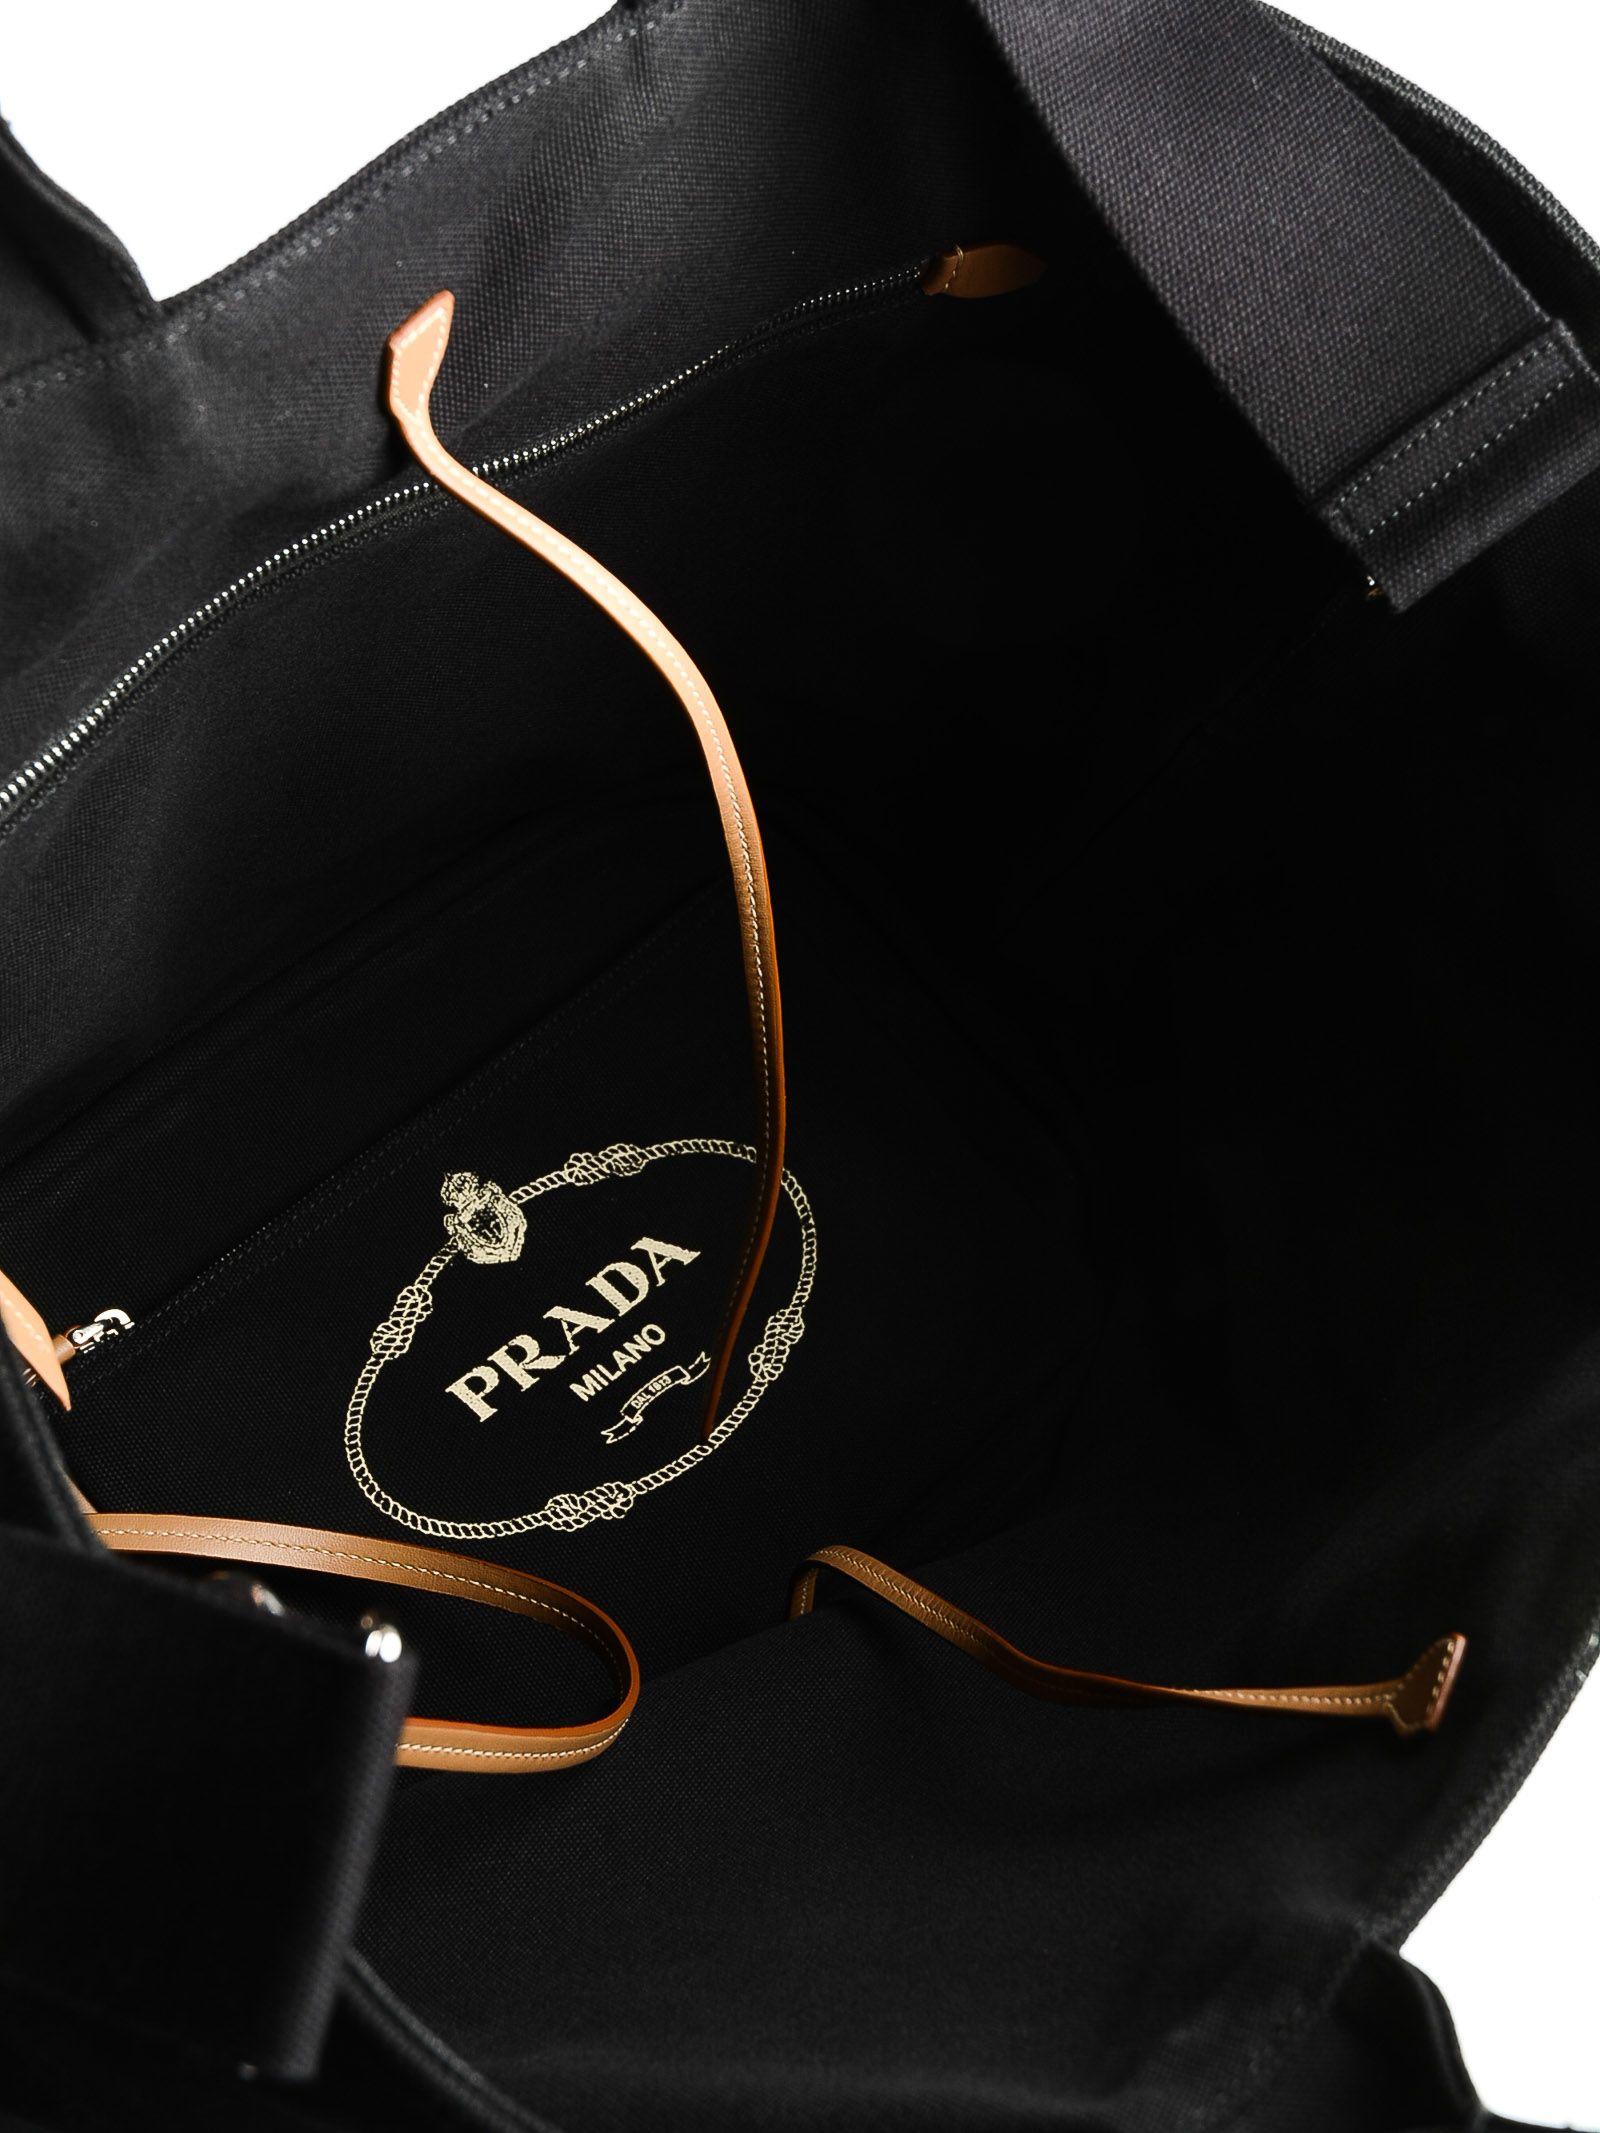 26e8780da9bea0 Prada Prada Logo Tote - Nero - 10781238 | italist